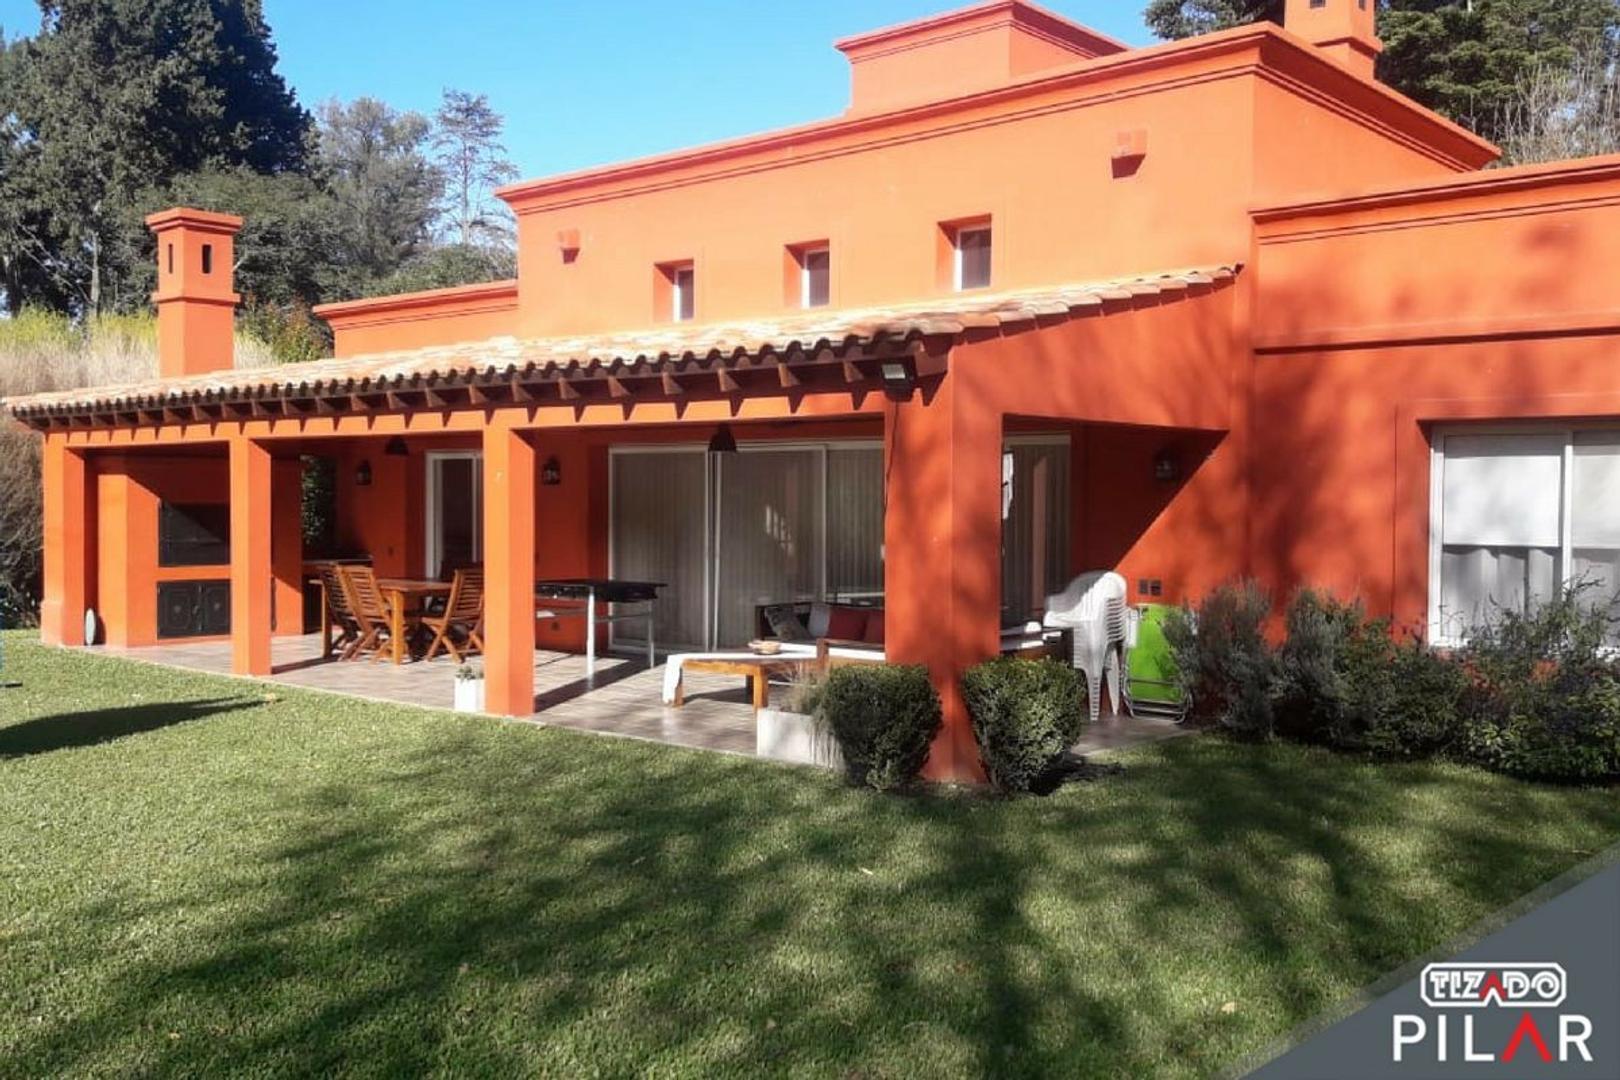 Tizado Pilar casa 4 ambientes en venta en Sausalito, Pilar  - PIL3848_LP172285_1